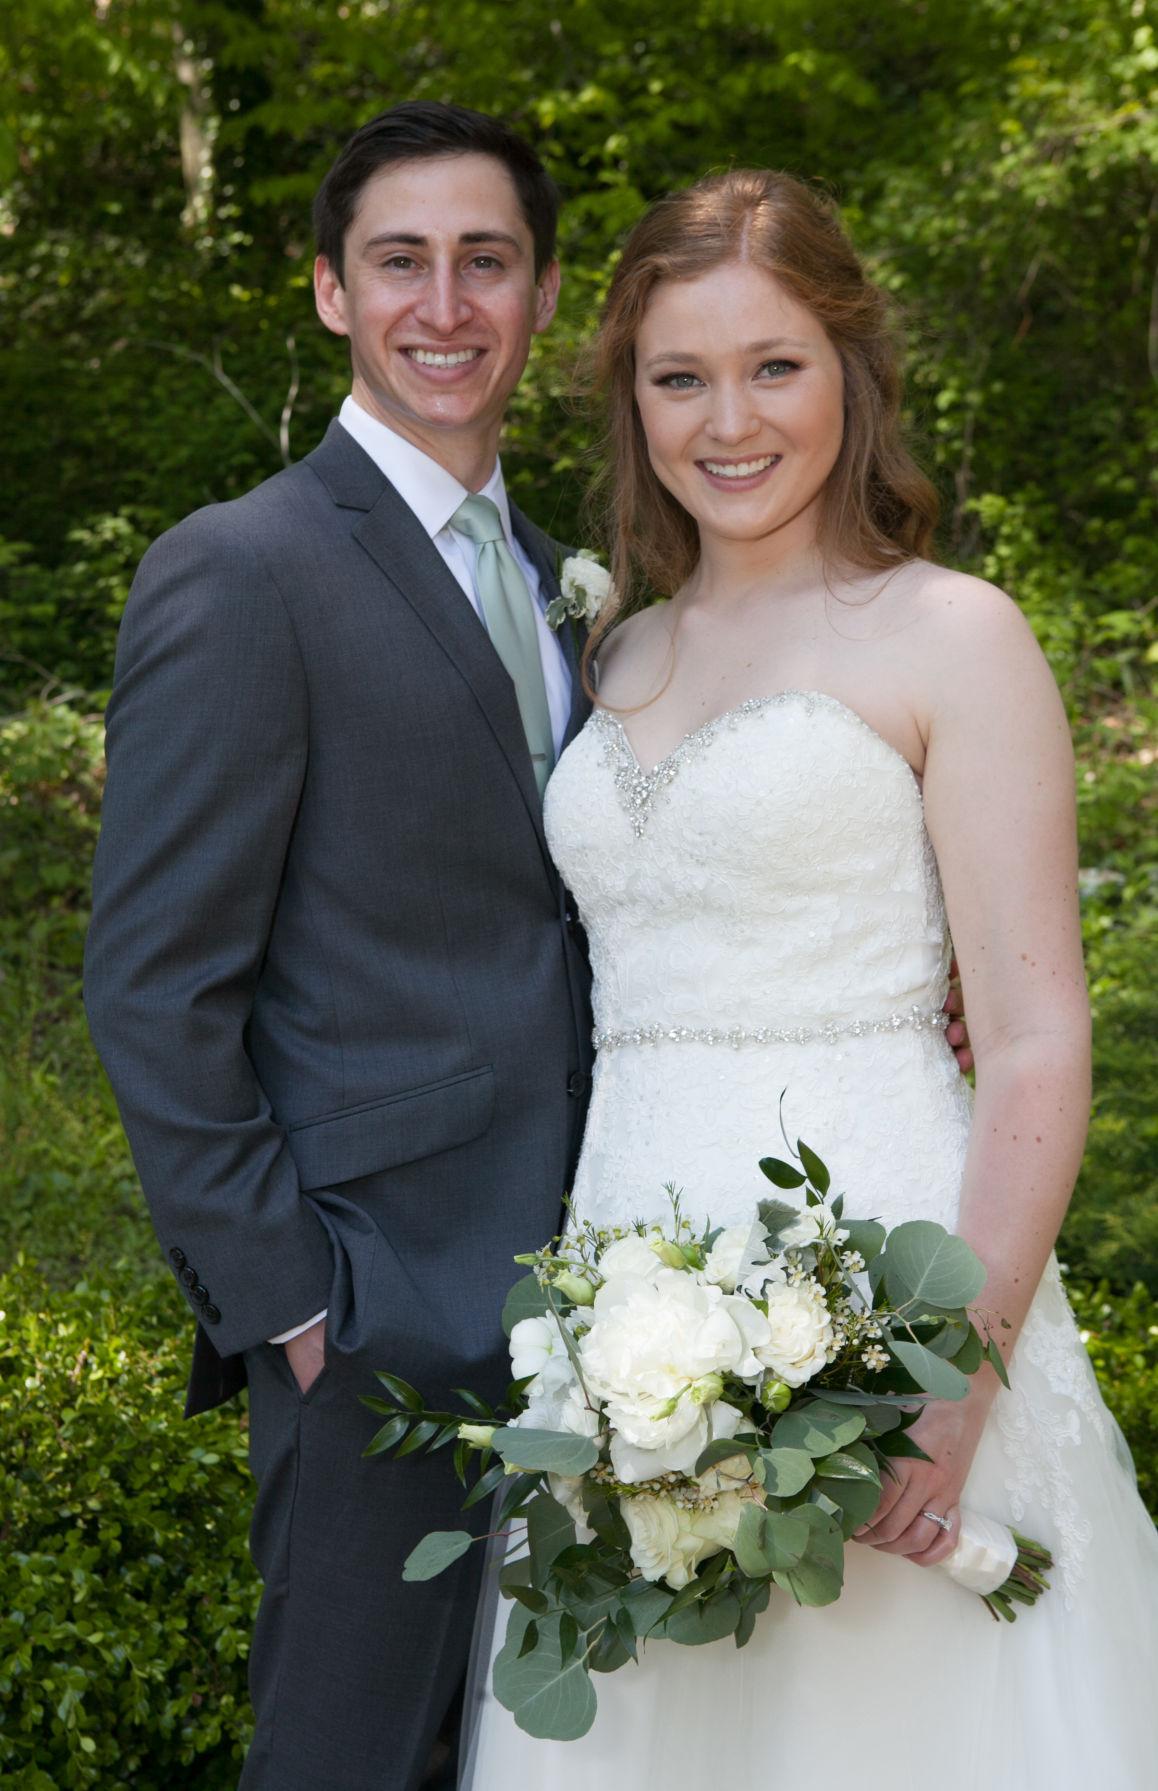 Scott David Hochberg and Ashley Elizabeth Biales Wise